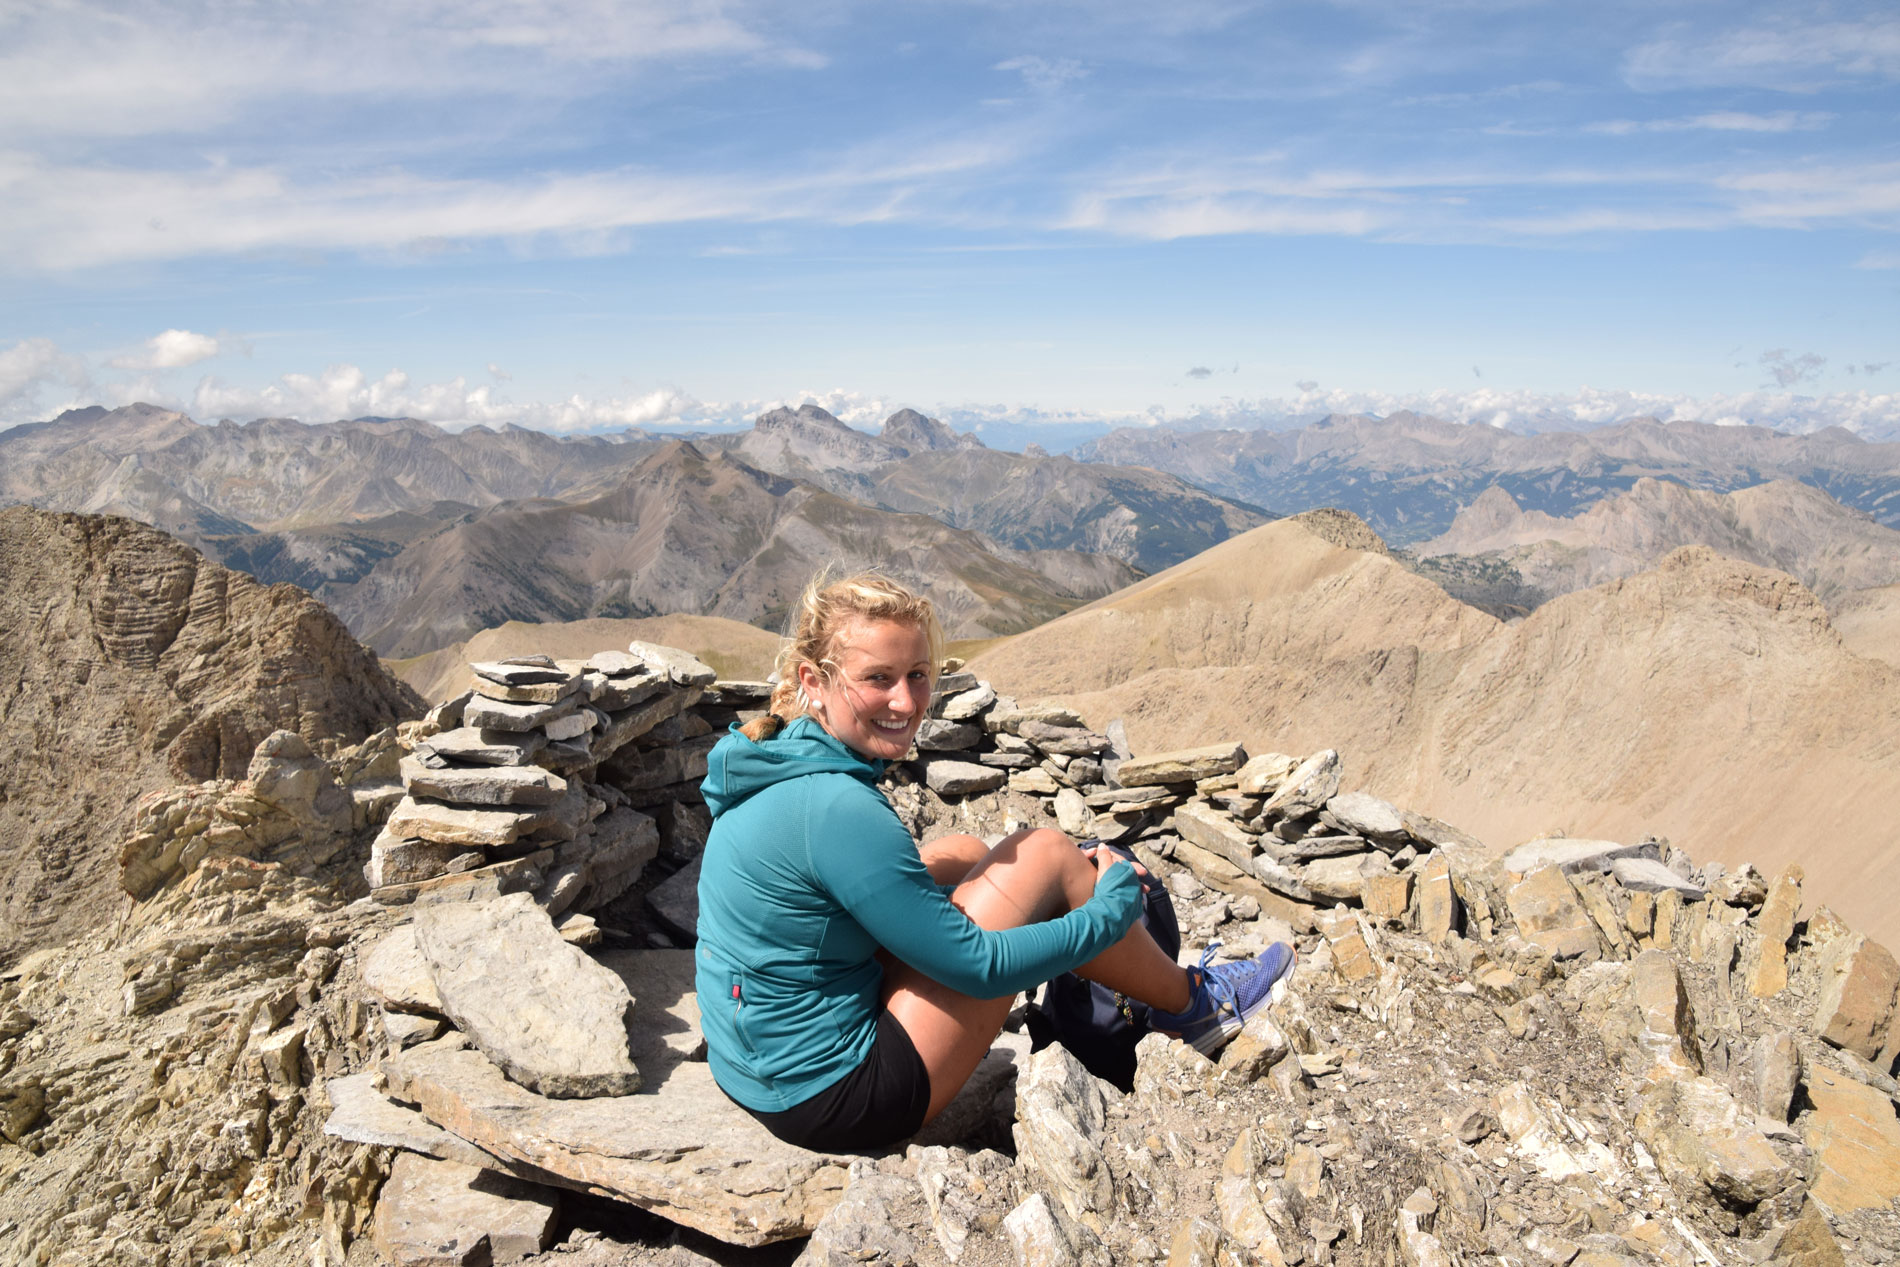 munichmountaingirls-evemuc-eva-schuler-Mont-Pelat-nationalpark-Mercantour-suedfrankreich